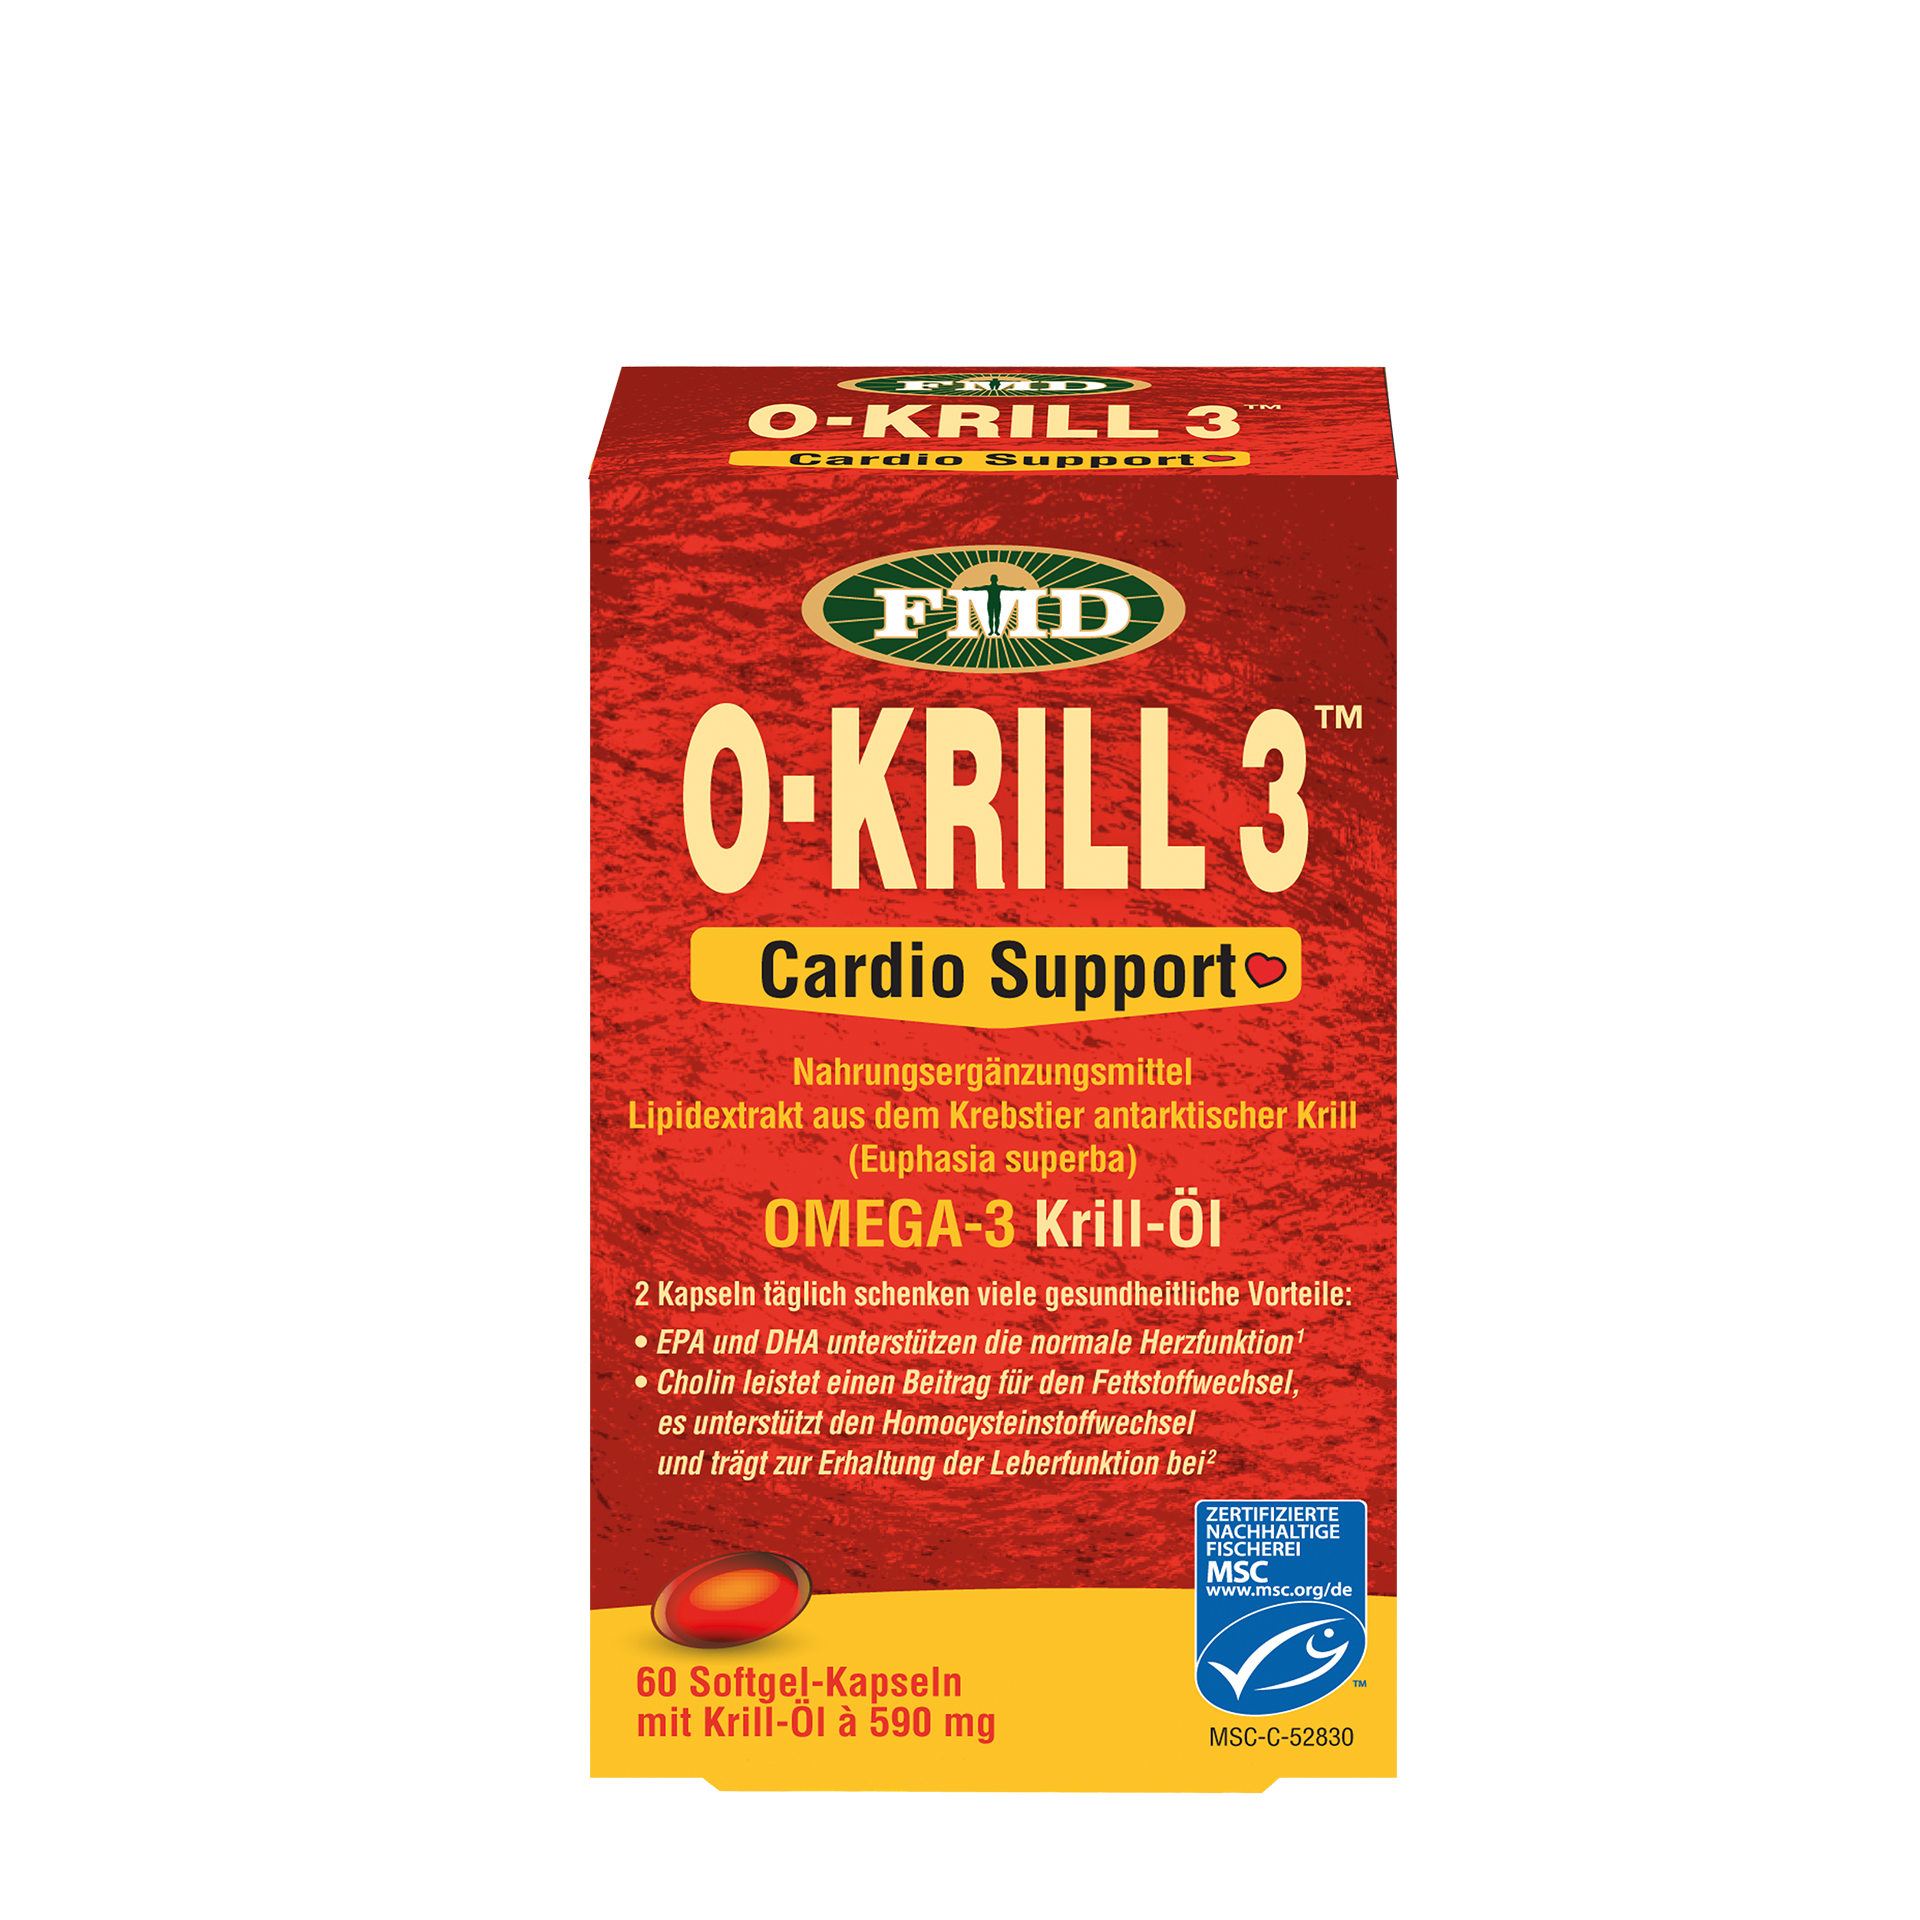 Krillöl O-Krill 3 Cardio Support